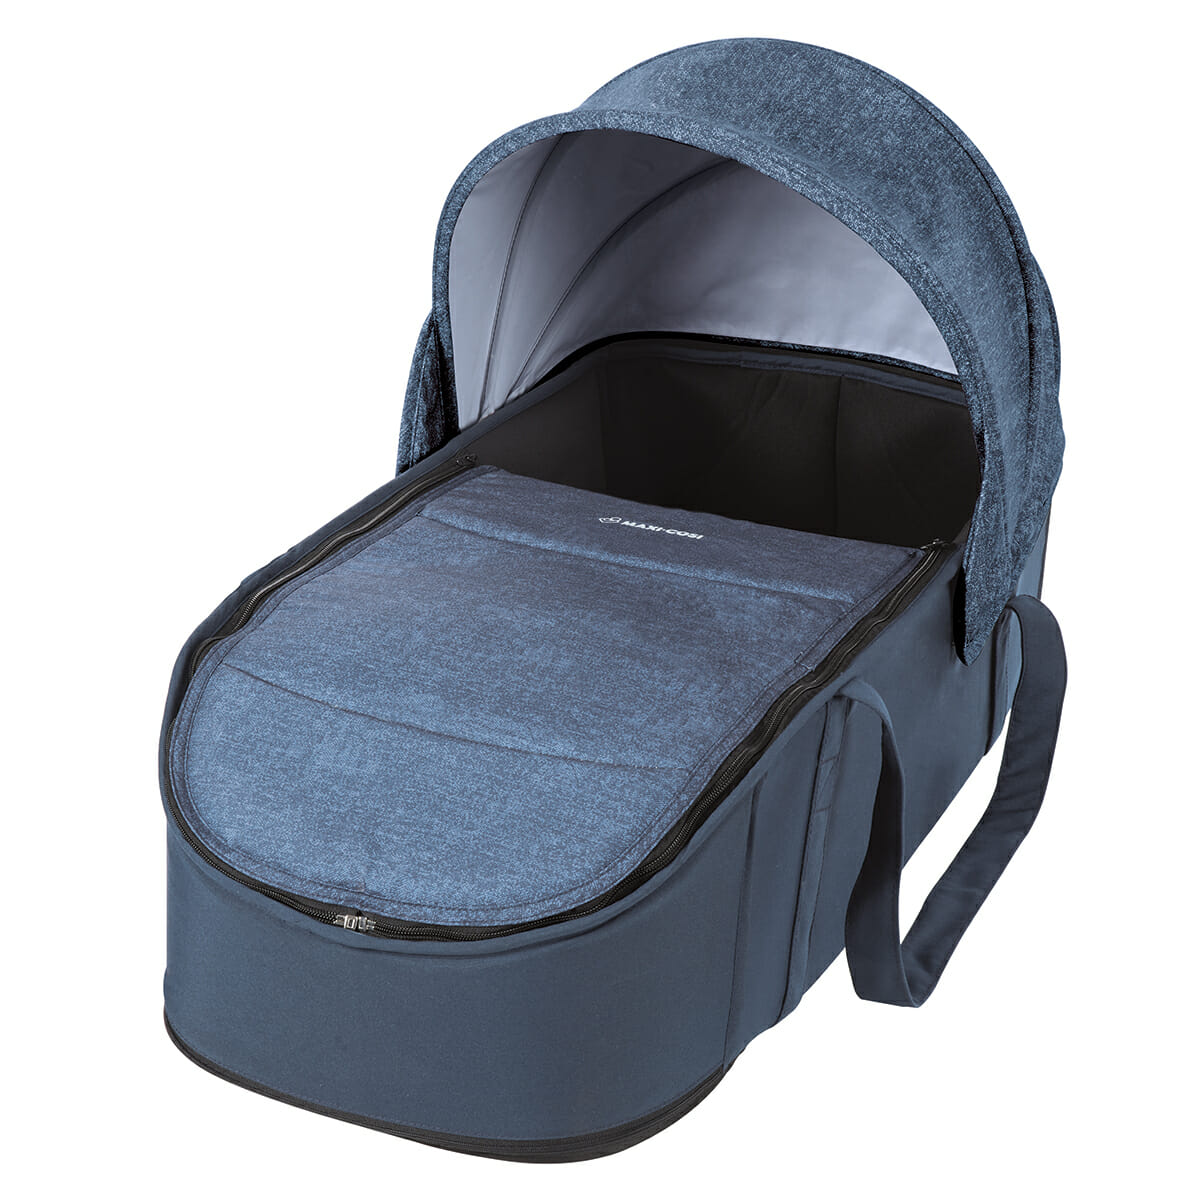 Maxicosi Stroller Carrycot Laikasoftcarrycot Laika Blue Nomadb